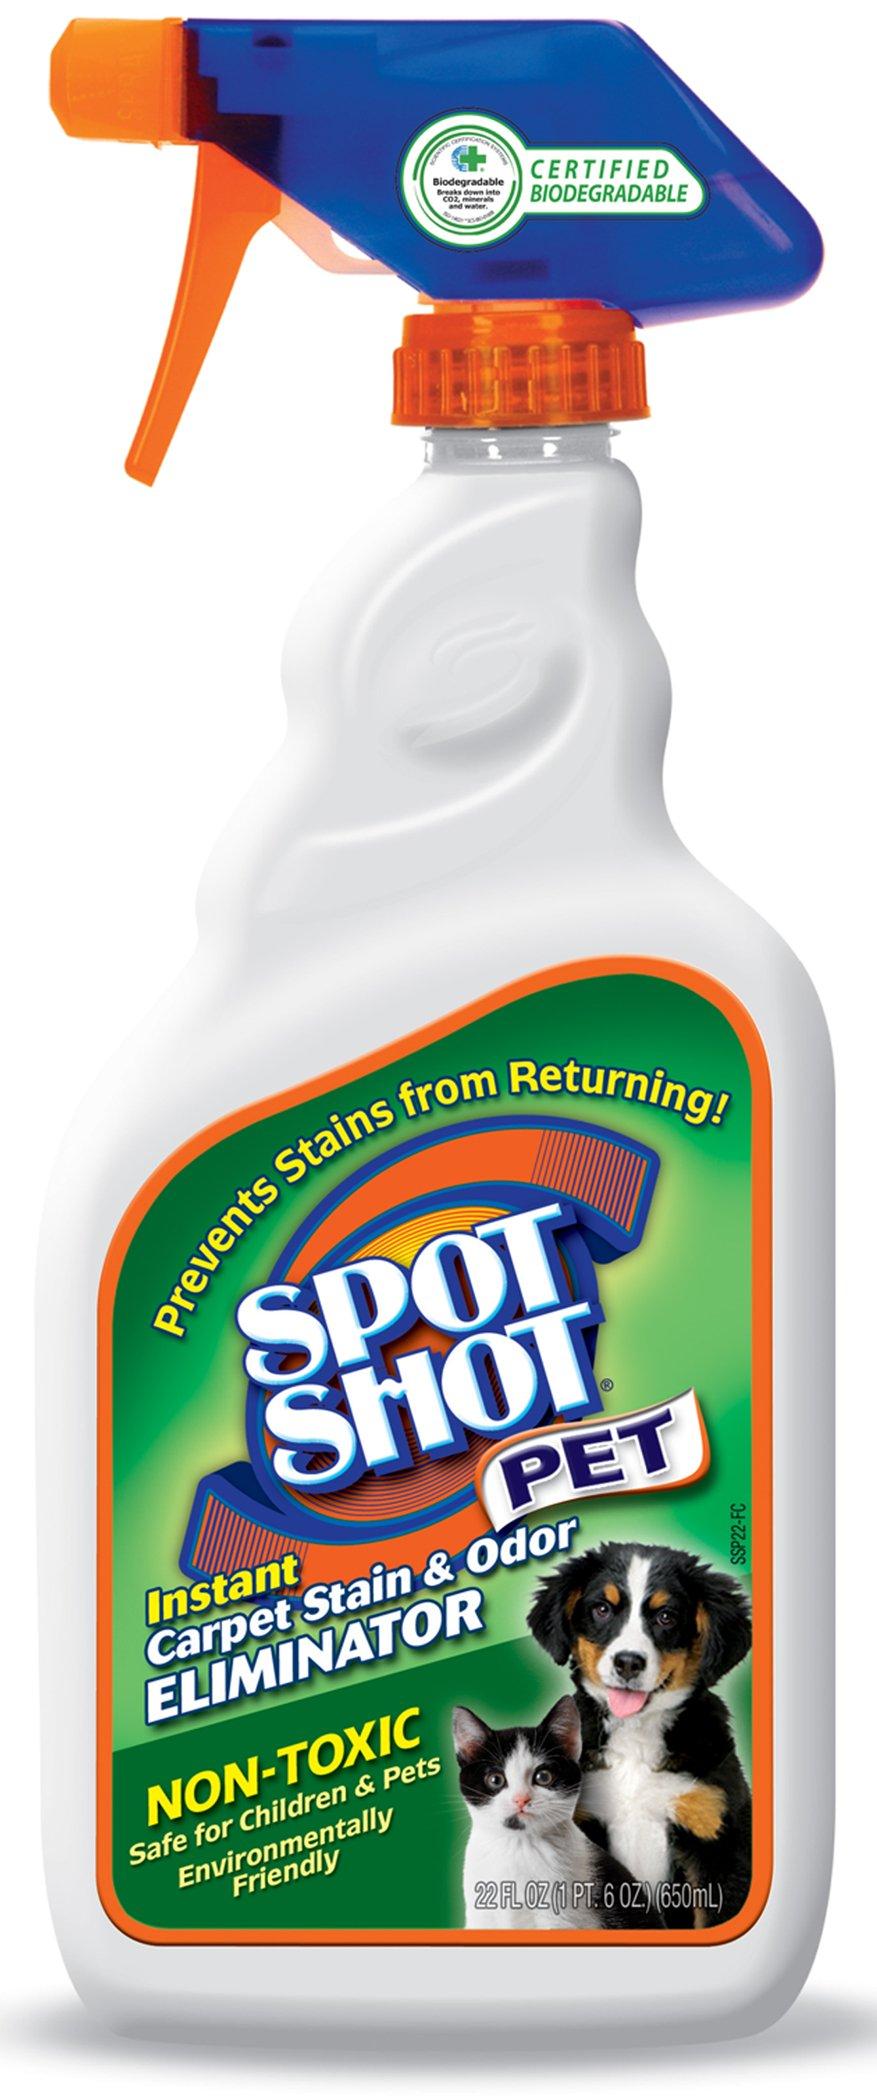 Spot Shot Pet Instant Carpet Stain & Odor Eliminator, 22 OZ [Non-Aerosol Trigger]